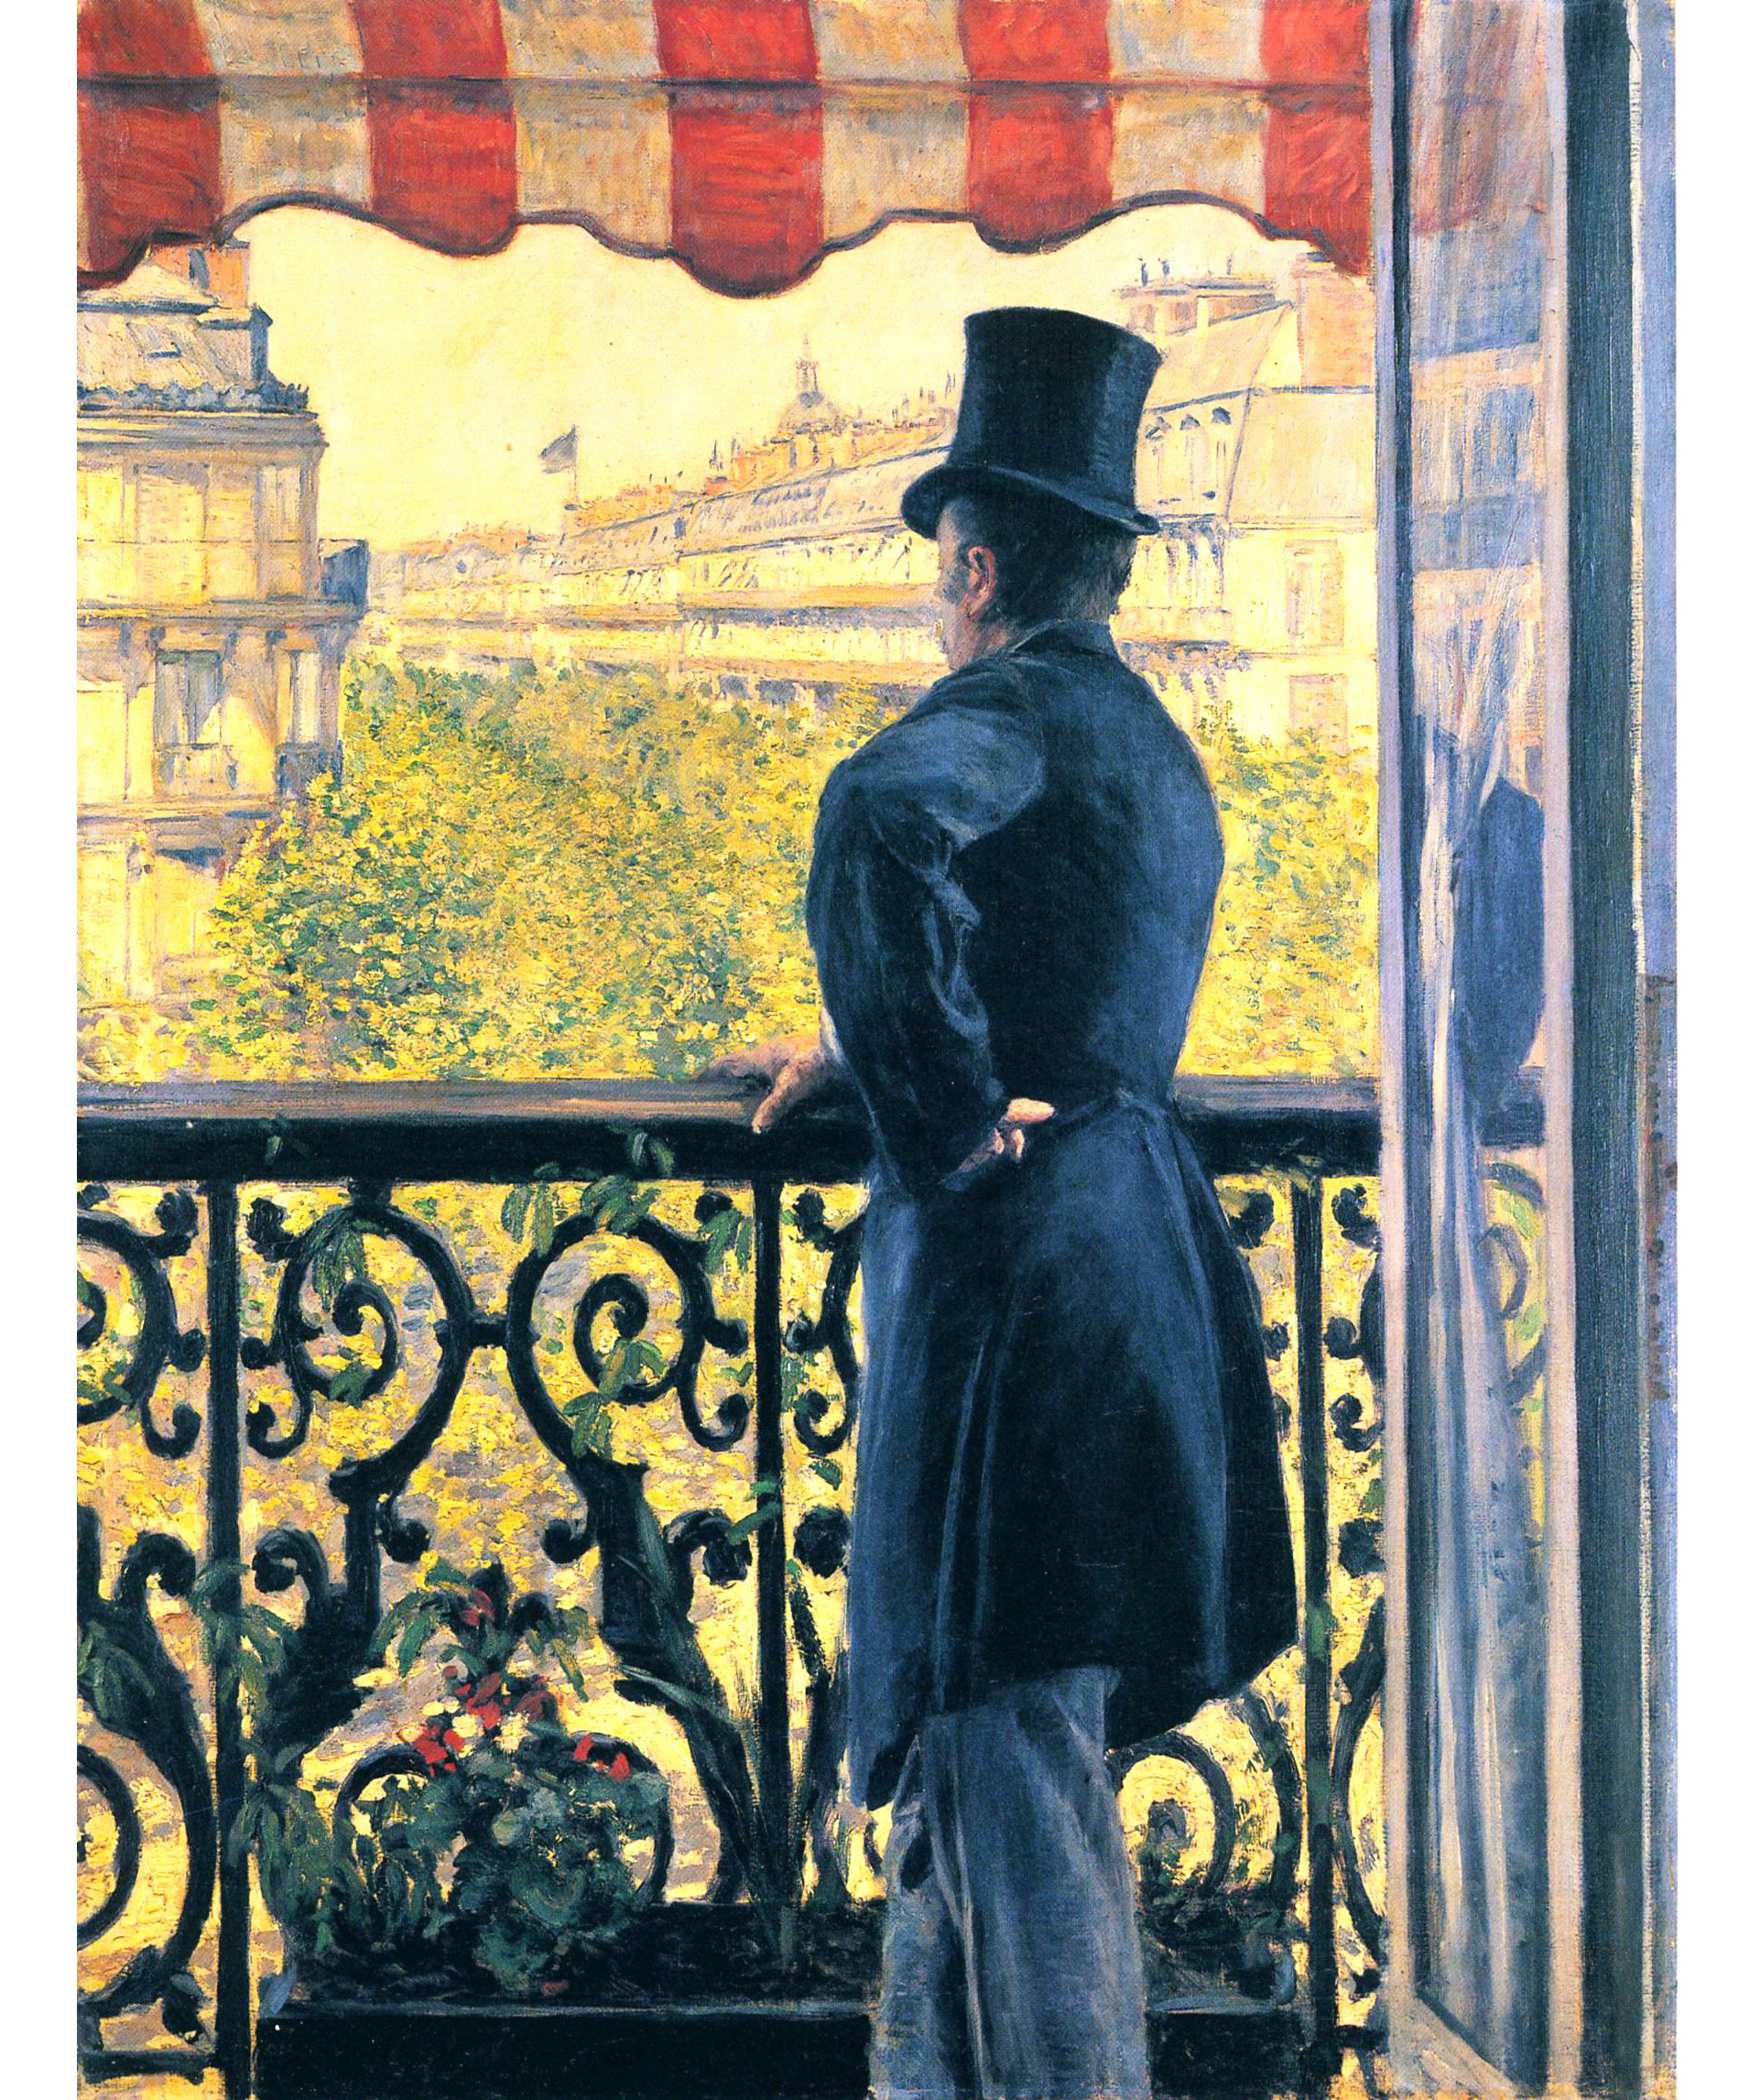 Gustave Caillebotte (Paris, 1848, 1894) Man on Balcony, Boulevard Haussmann, 1880